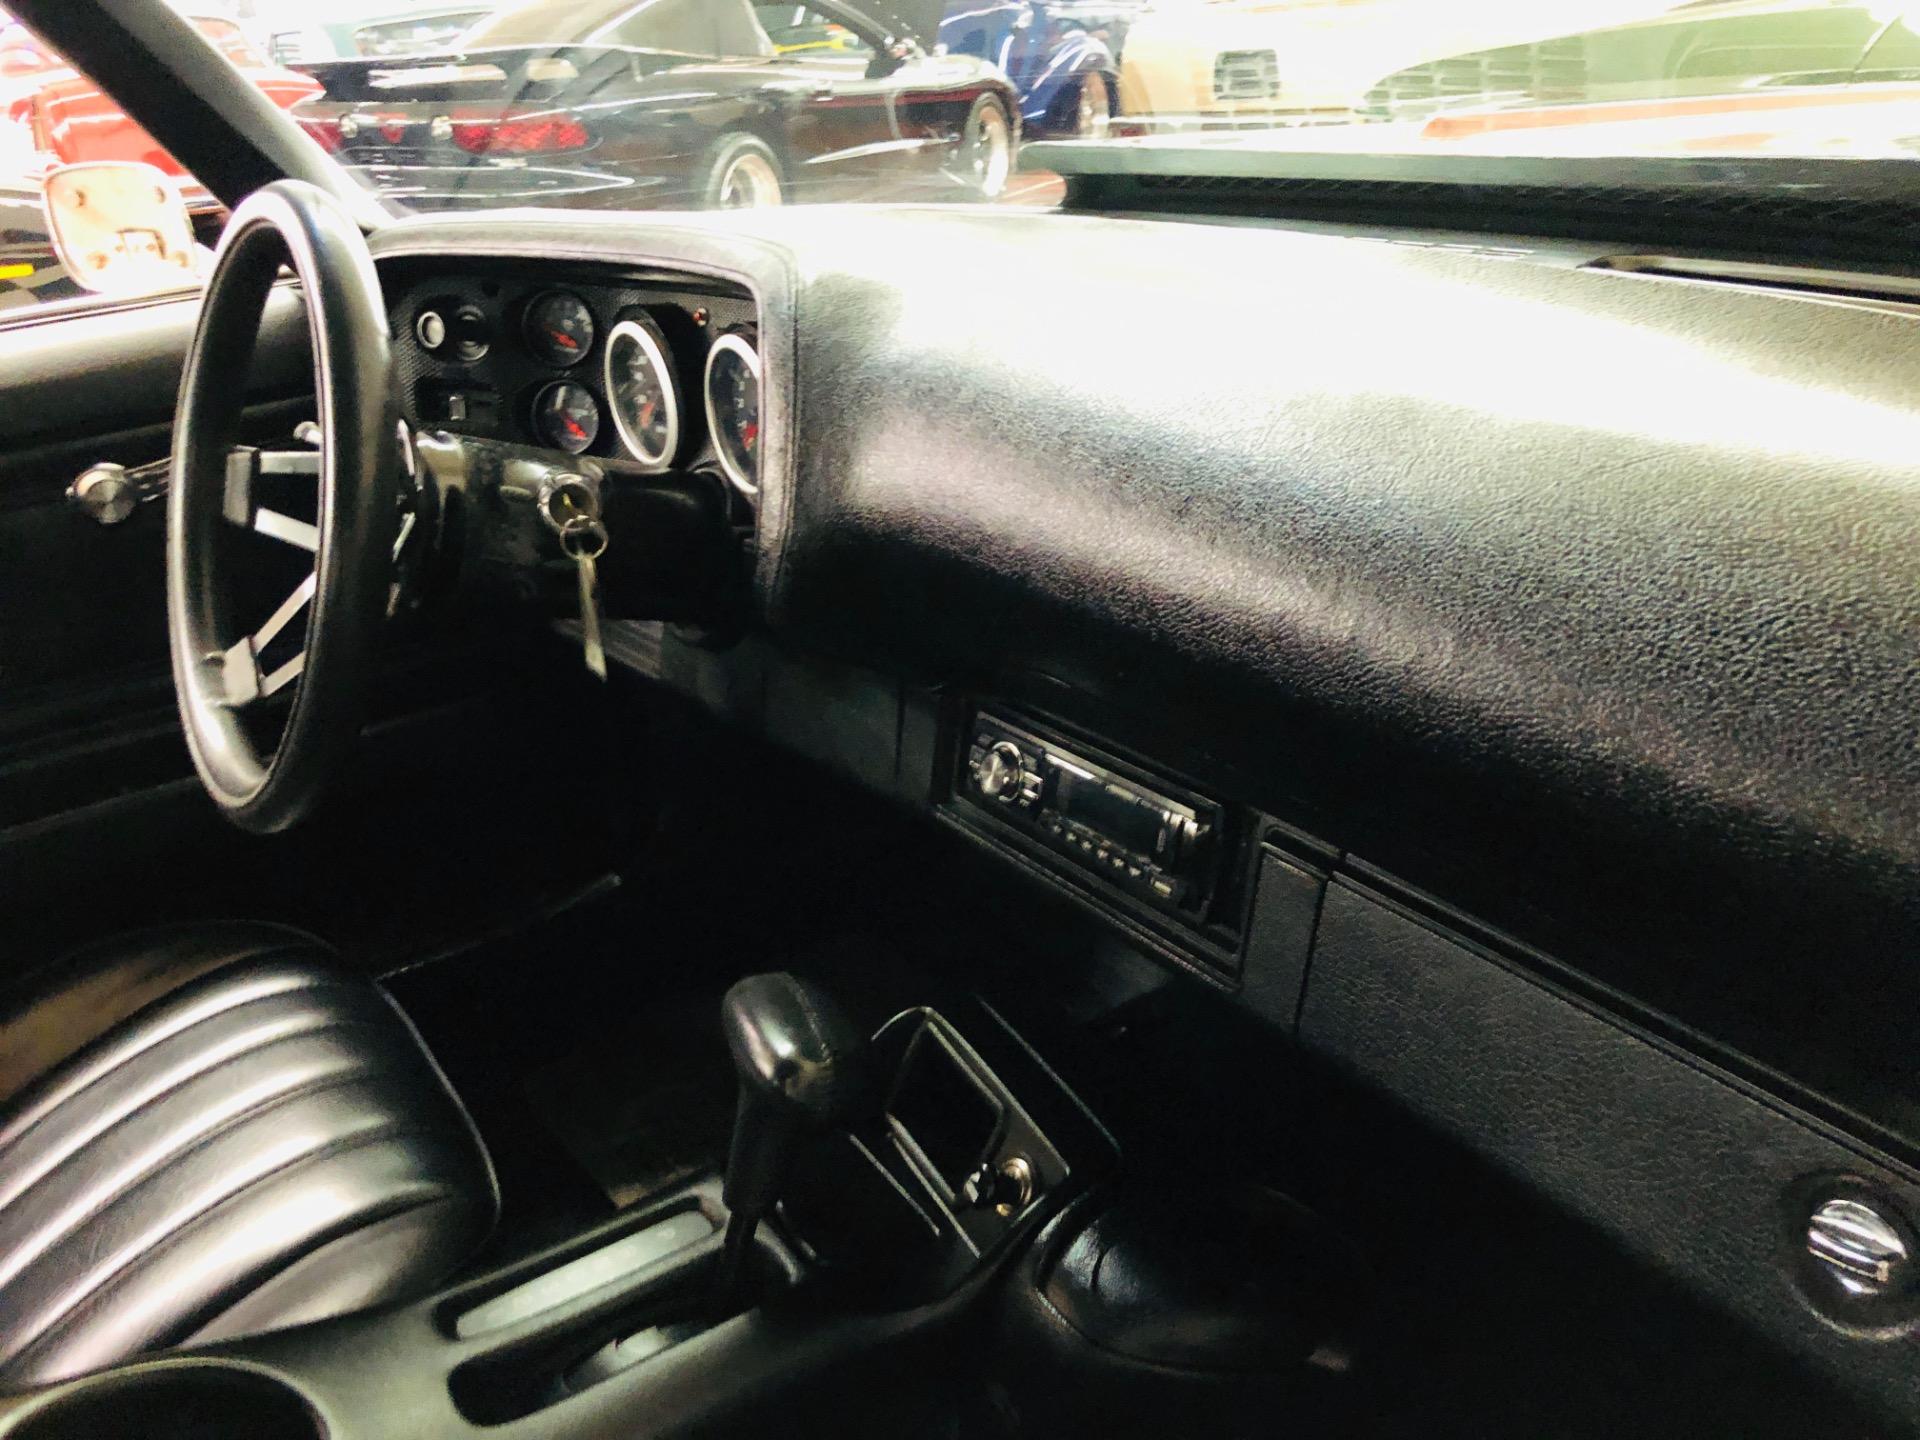 Used 1973 Chevrolet Camaro - LS1 V8 - 4L60 TRANS - RESTO MOD - SEE VIDEO | Mundelein, IL